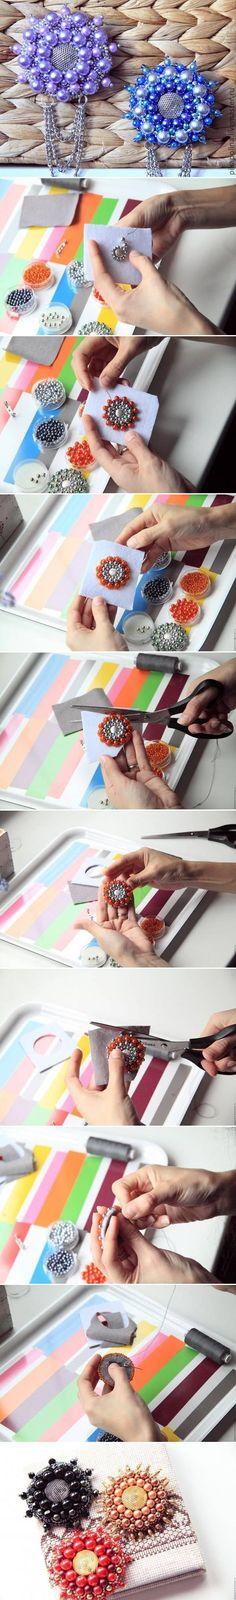 DIY Beads Flower Brooch.Craft ideas 4740 - LC.Pandahall.com